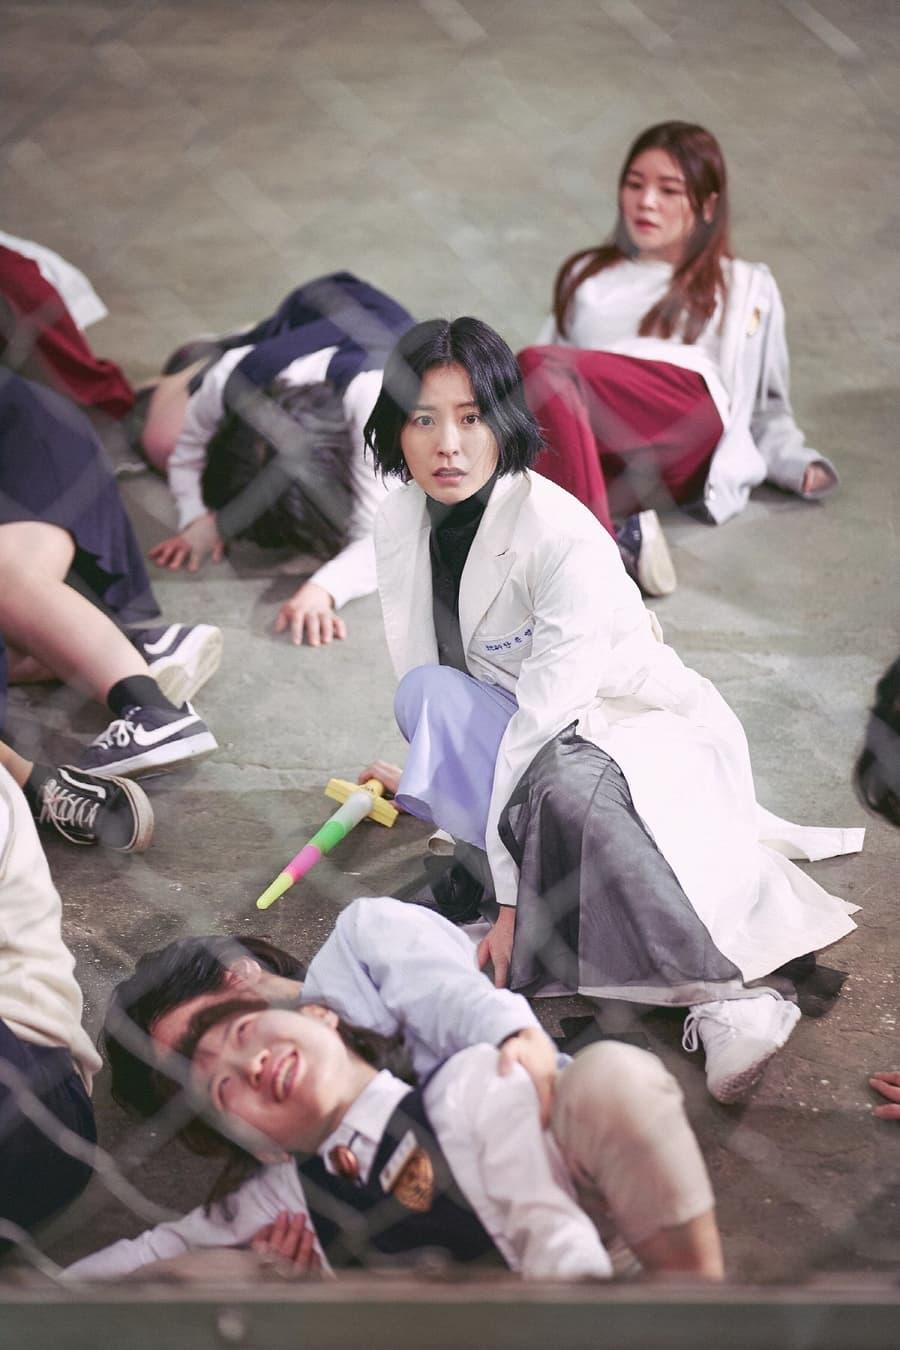 The School Nurse Files ครูพยาบาลแปลก ปีศาจป่วน